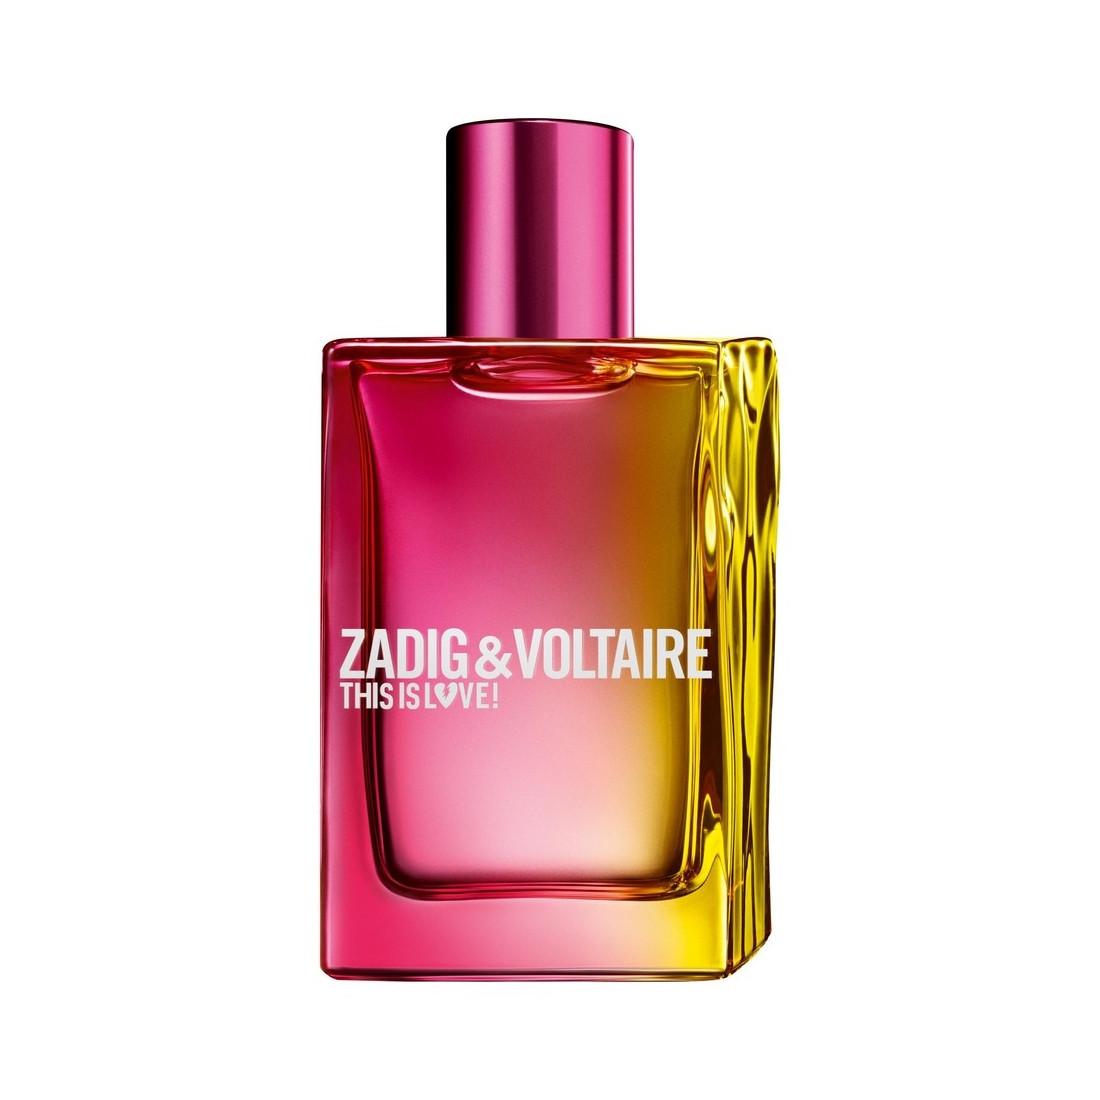 Zadig & Voltaire This Is Love! For Her Eau De Parfum Spray 50 ml